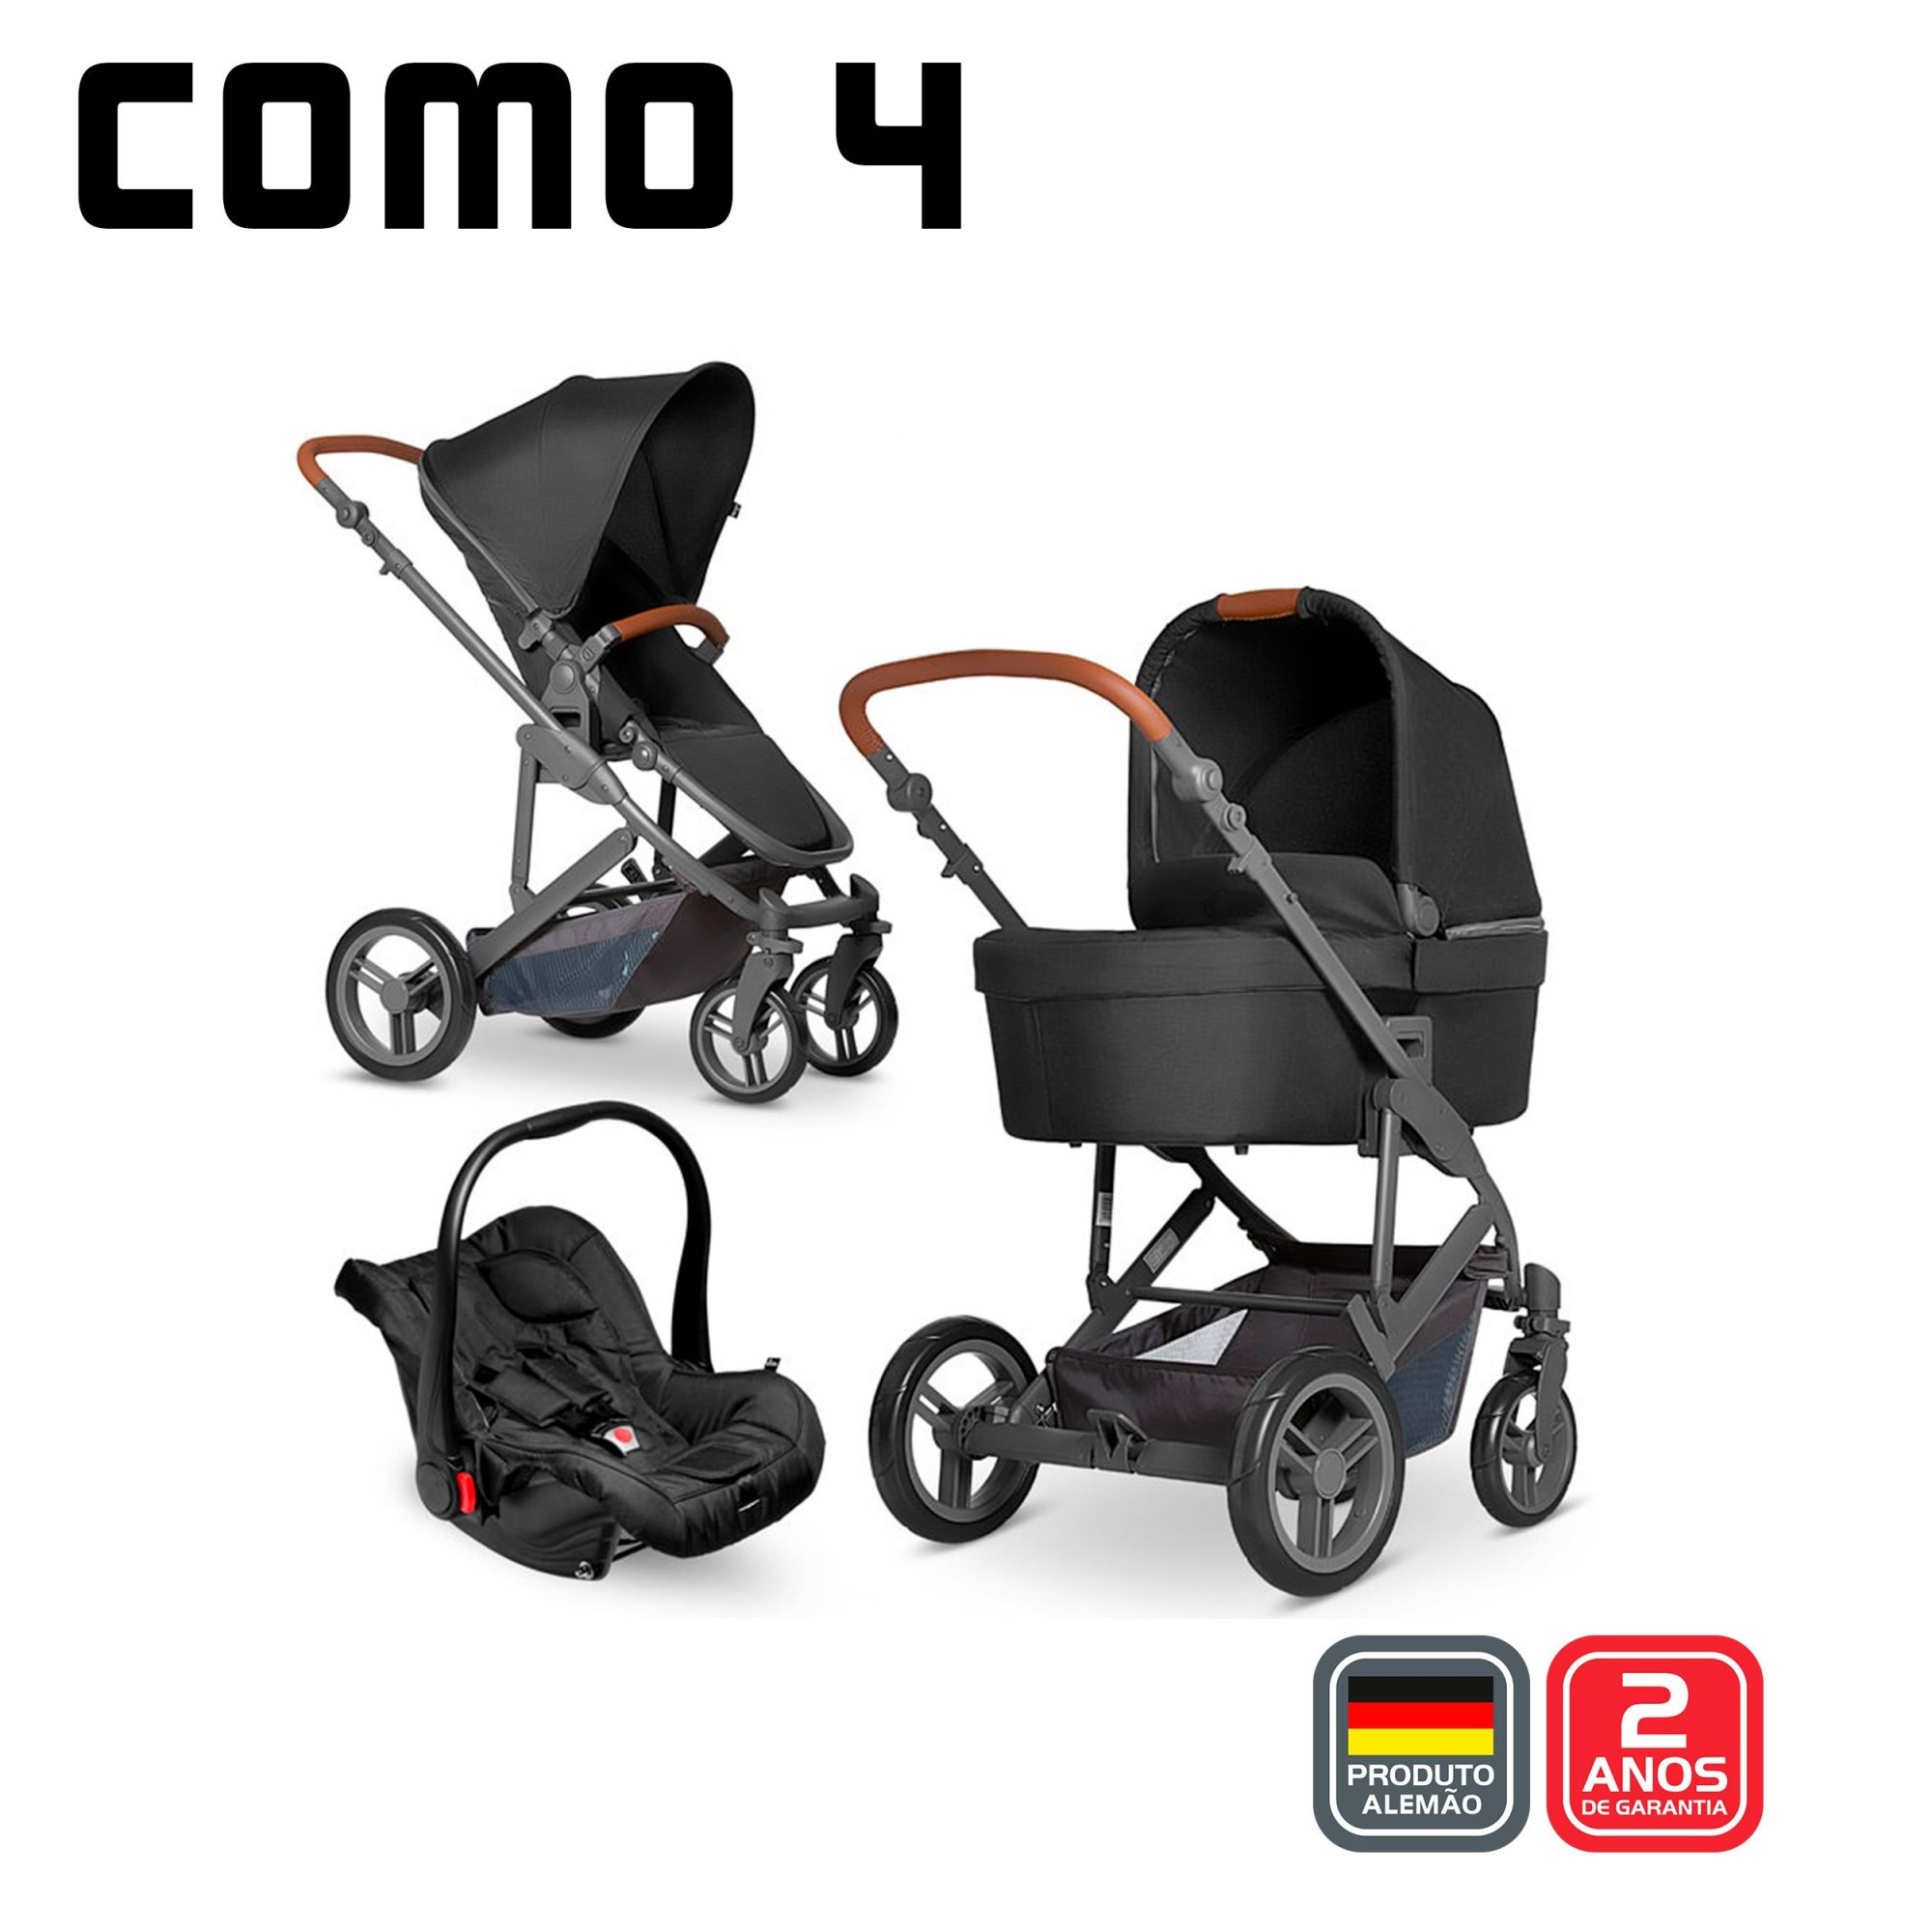 Carro Abc Trio Como 4 Couro (Carro/Moises/Bb /Adapt/ Bolsa) Woven Black